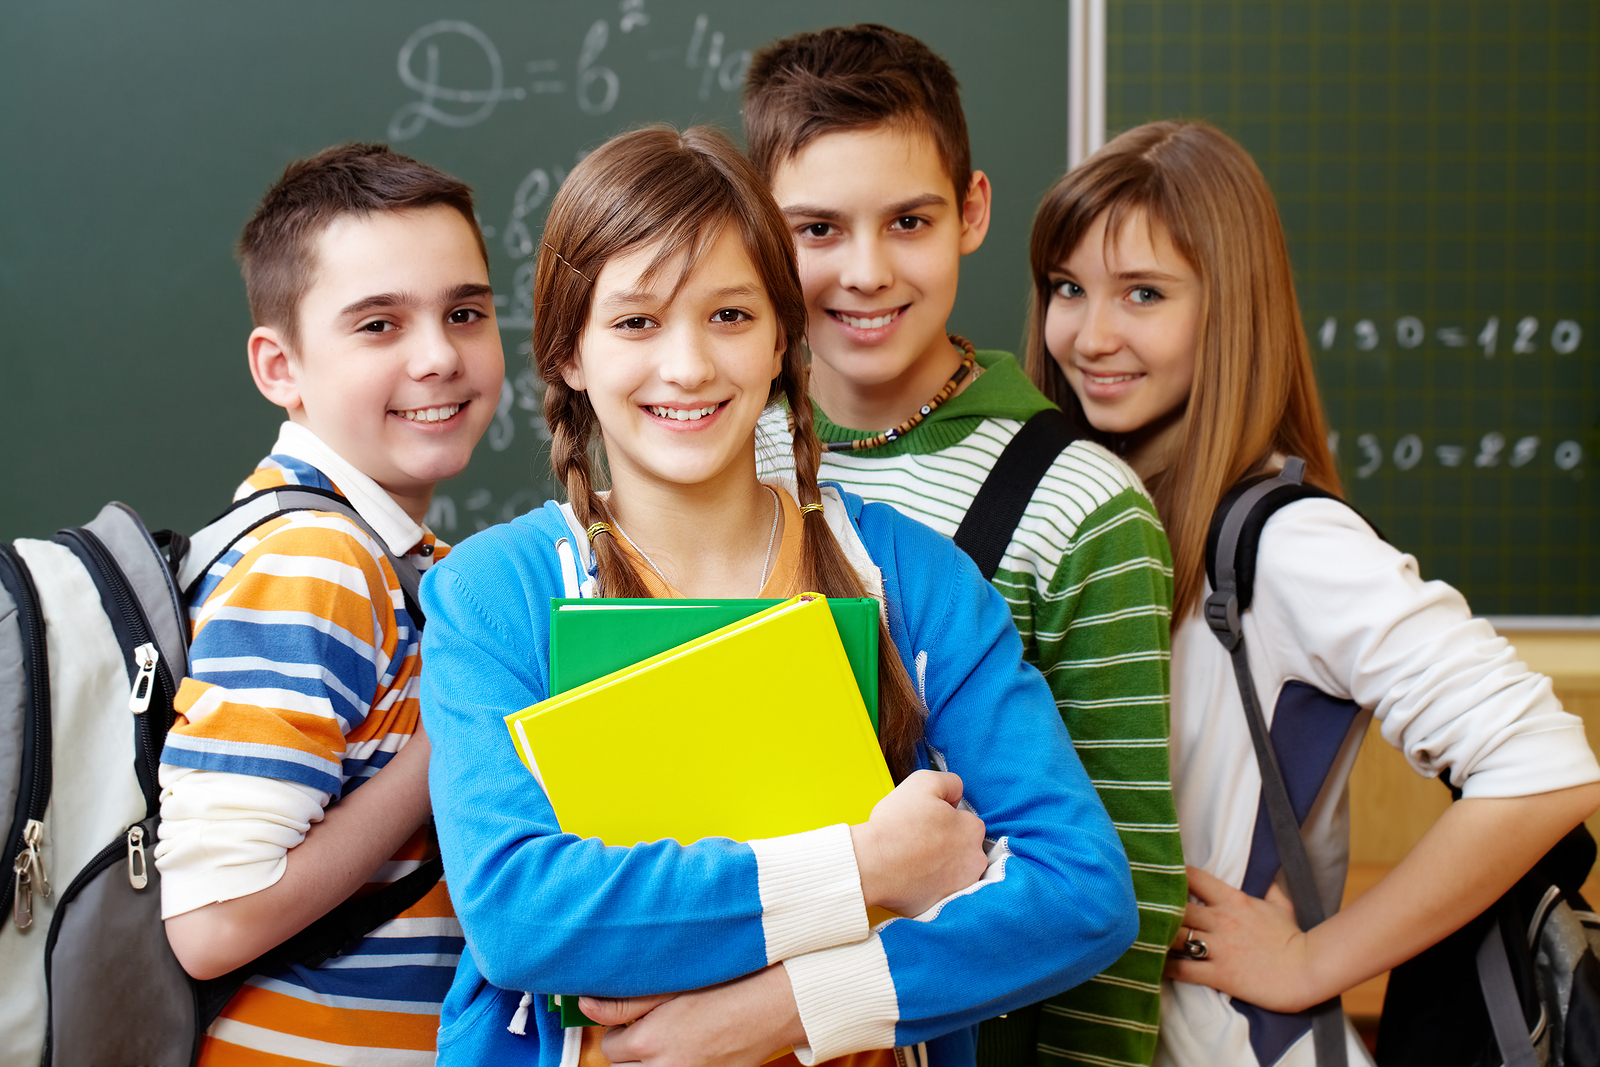 Ministrul Sanatatii vrea o noua materie in scoli: Educatia pentru sanatate